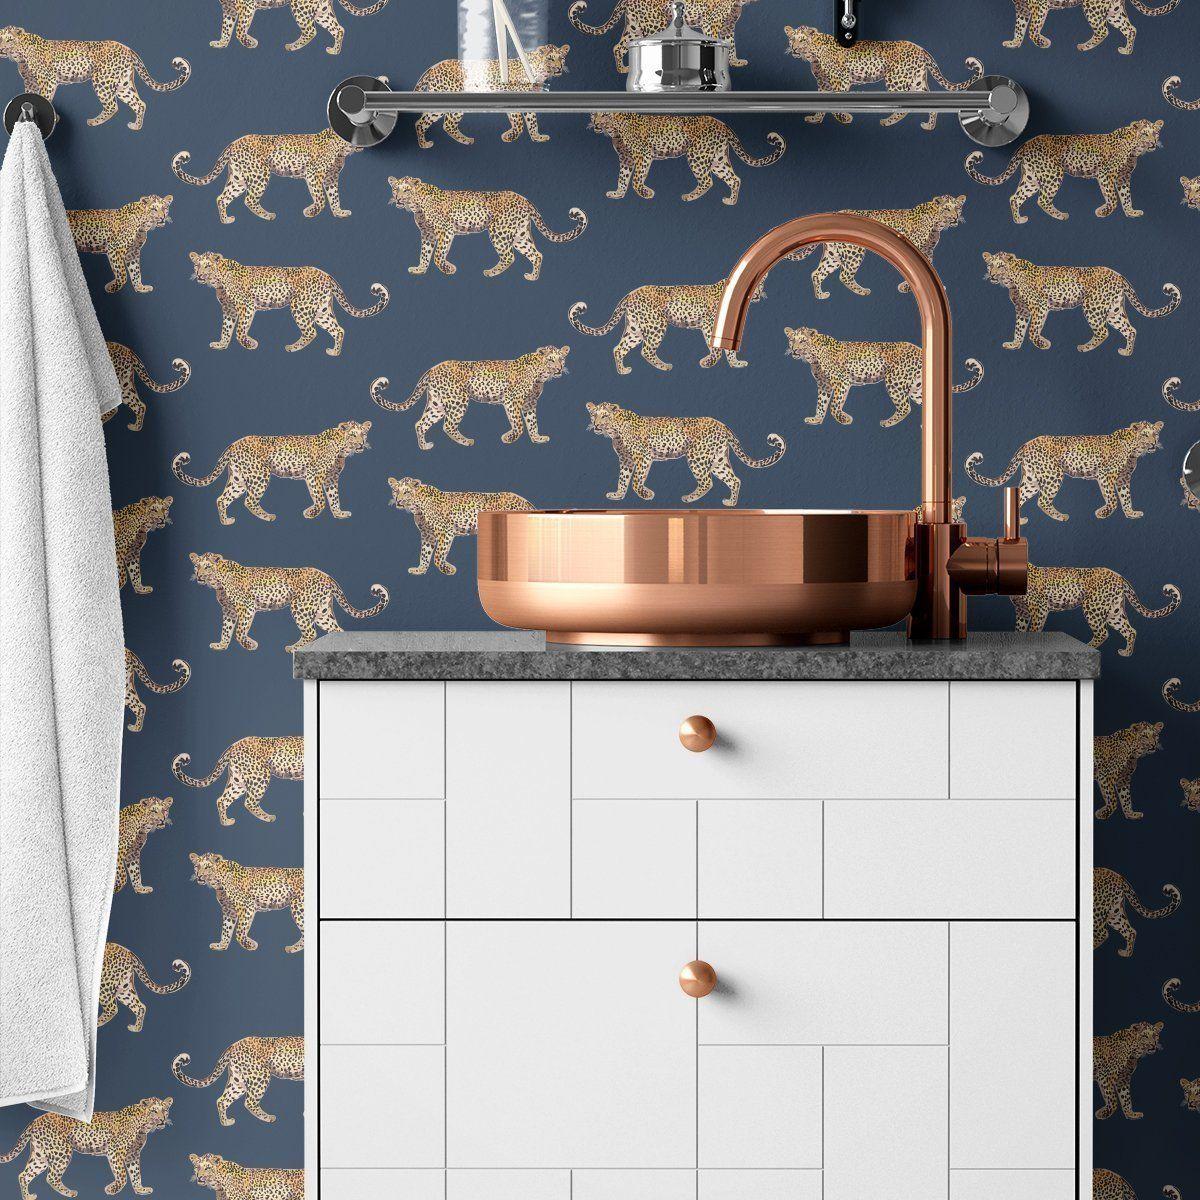 Cheetahs Peel & Stick Wallpaper Bathroom wallpaper